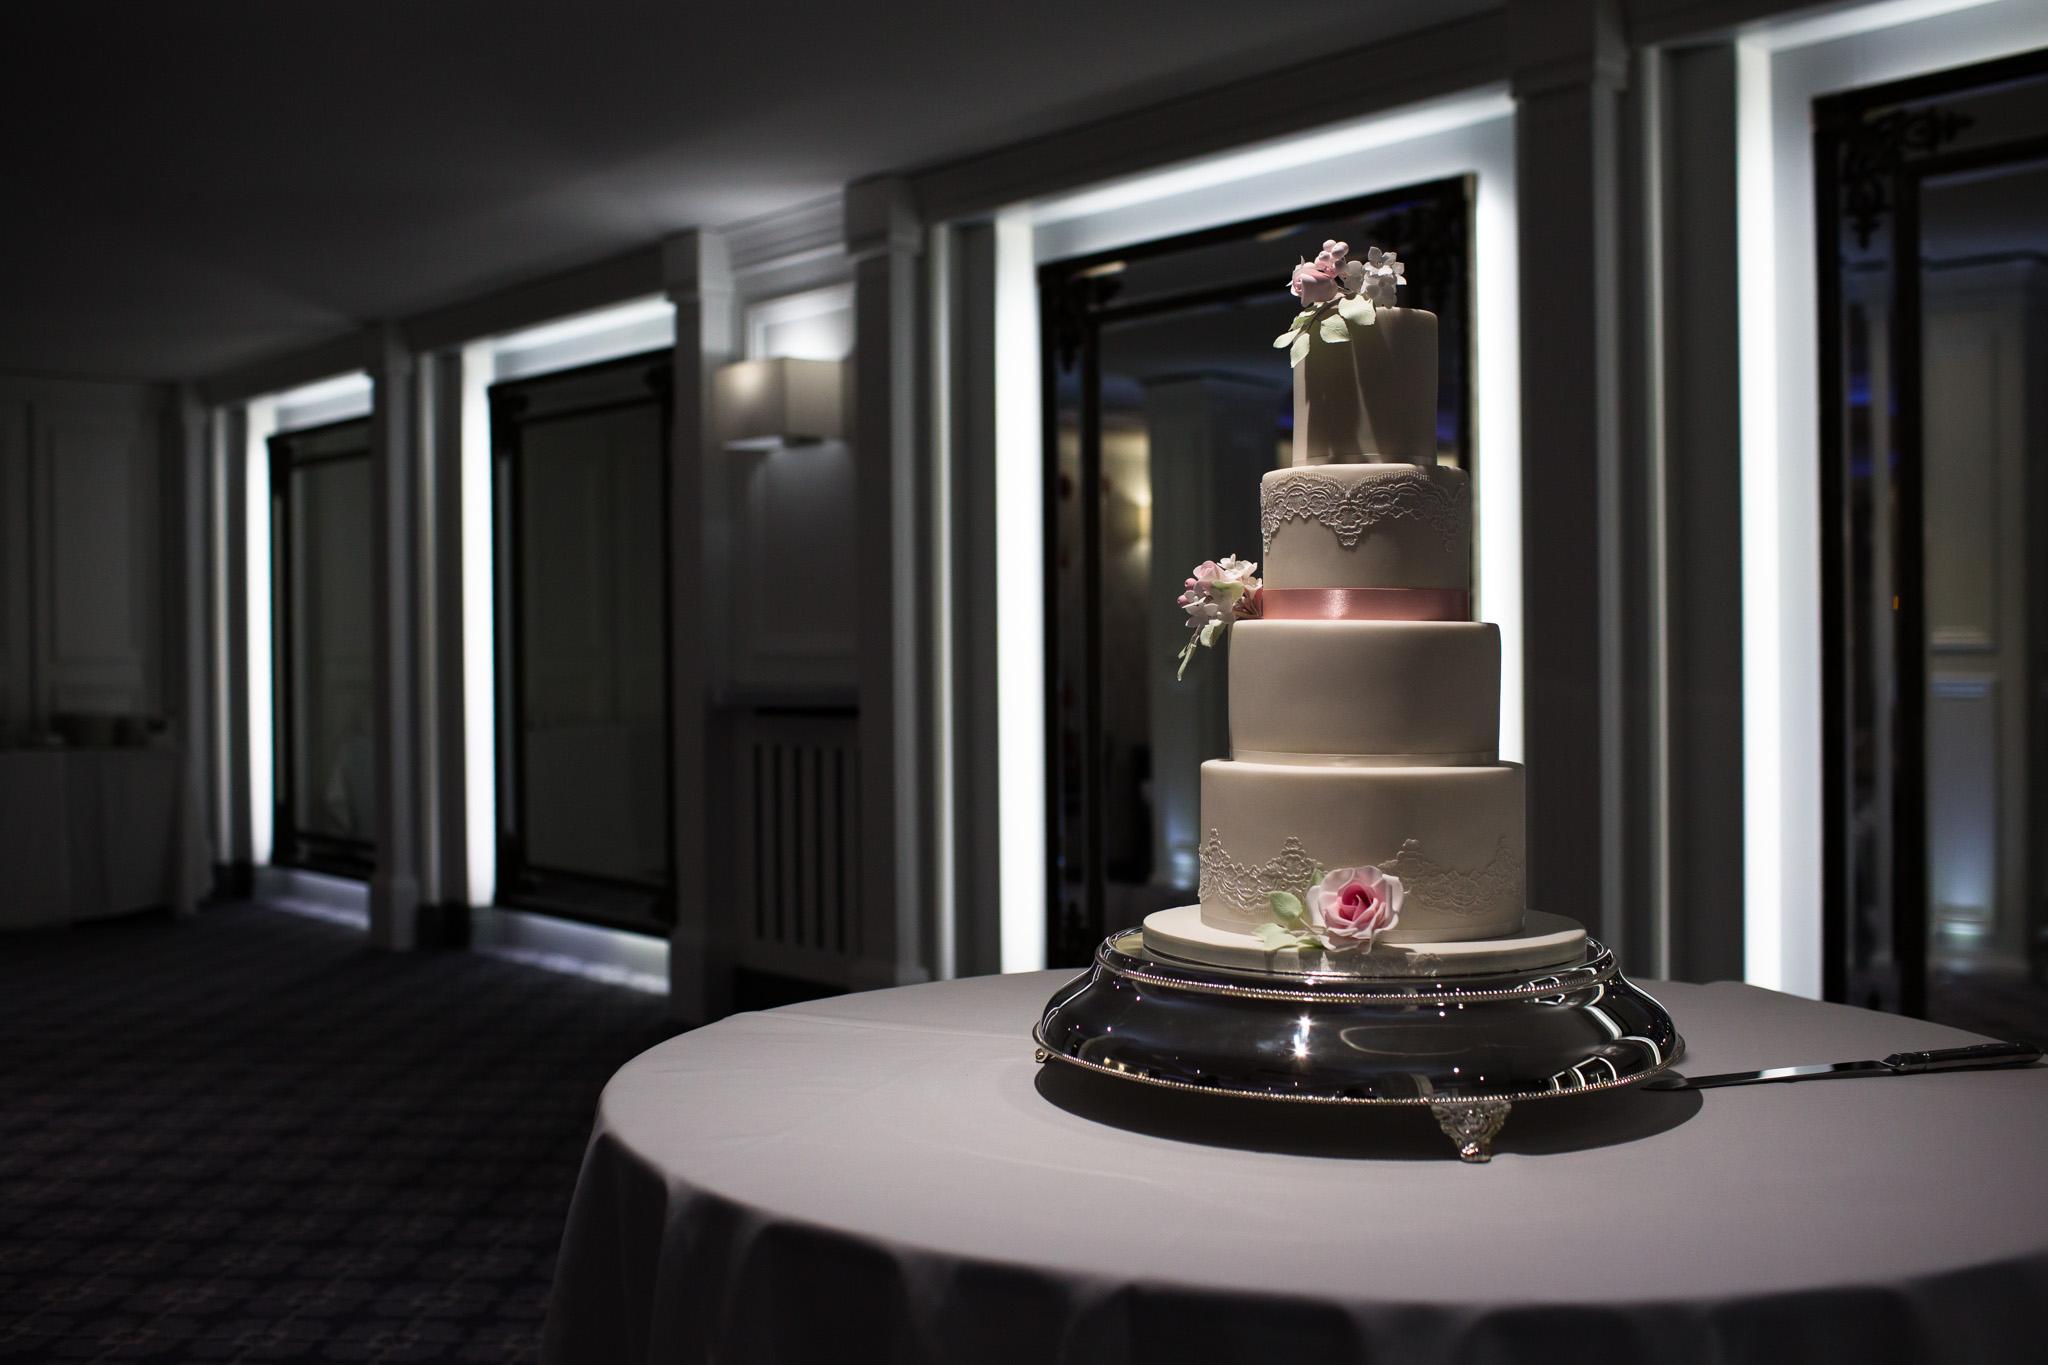 Mark_Barnes_Northern_Ireland_Wedding_Photography_Leighinmohr-house-hotel-ballymena_Wedding_Photography-46.jpg